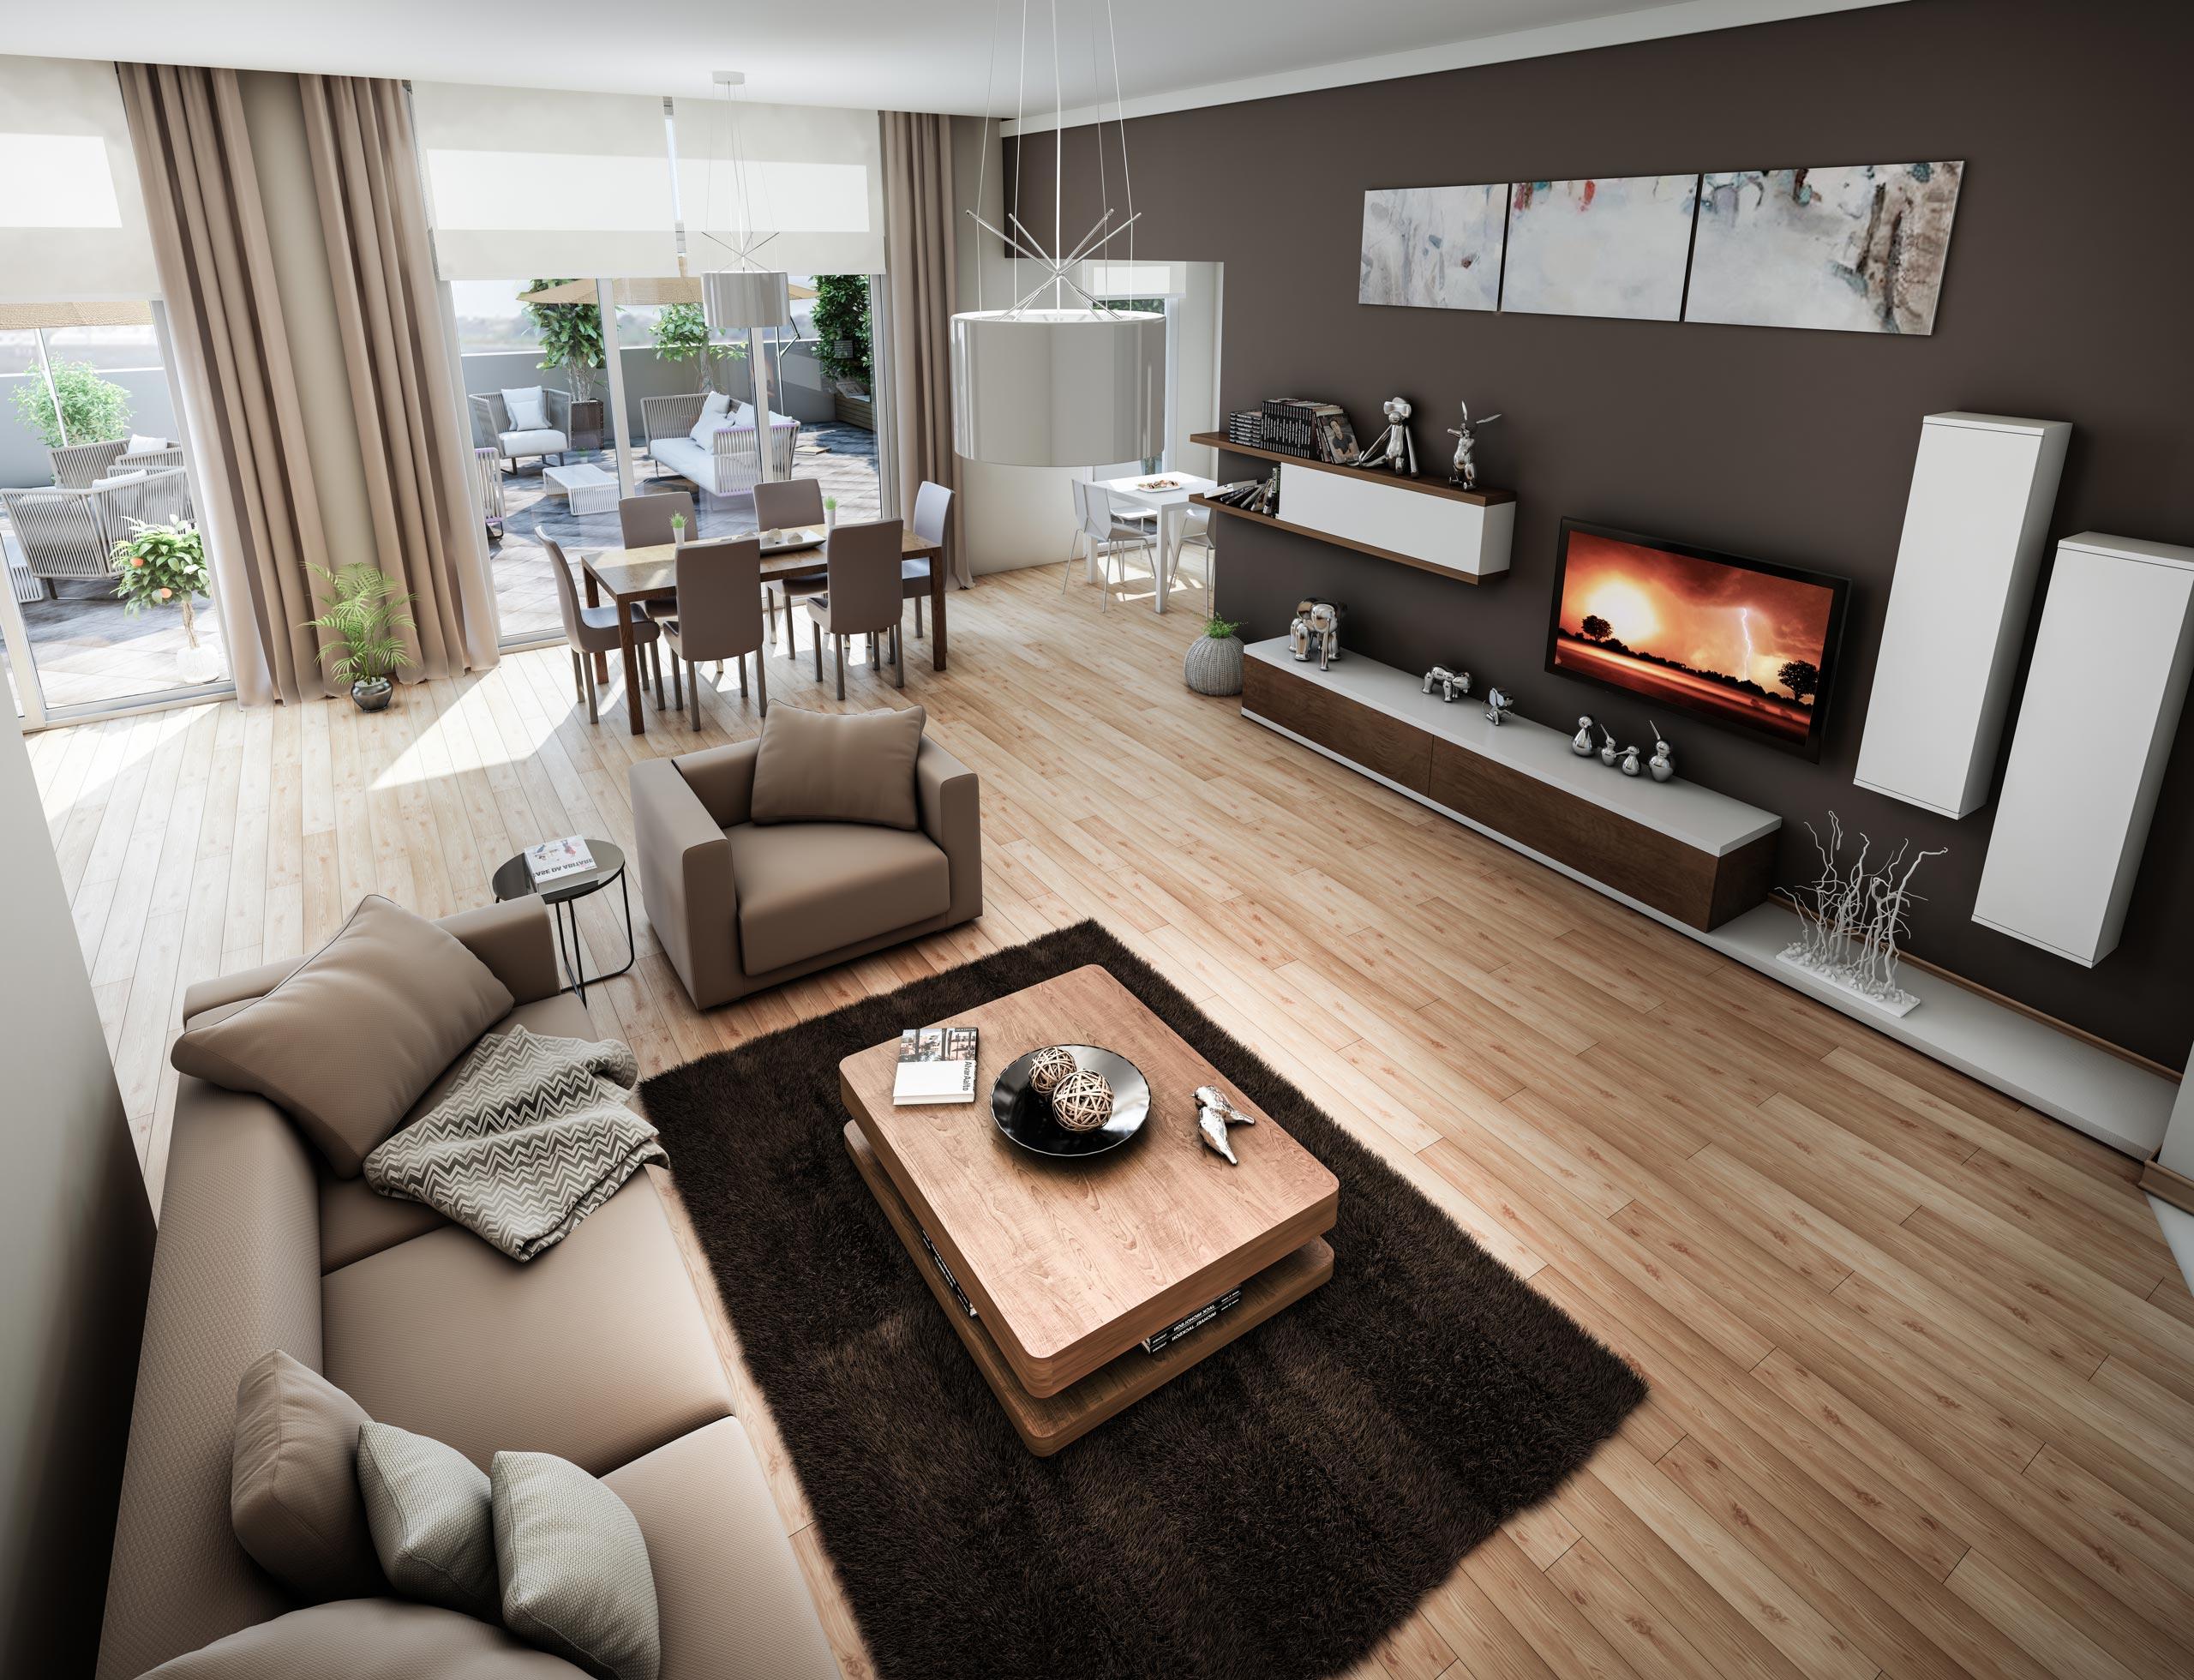 Nurol gyo cendere interior design redwhite cgi for Interior design agency uk